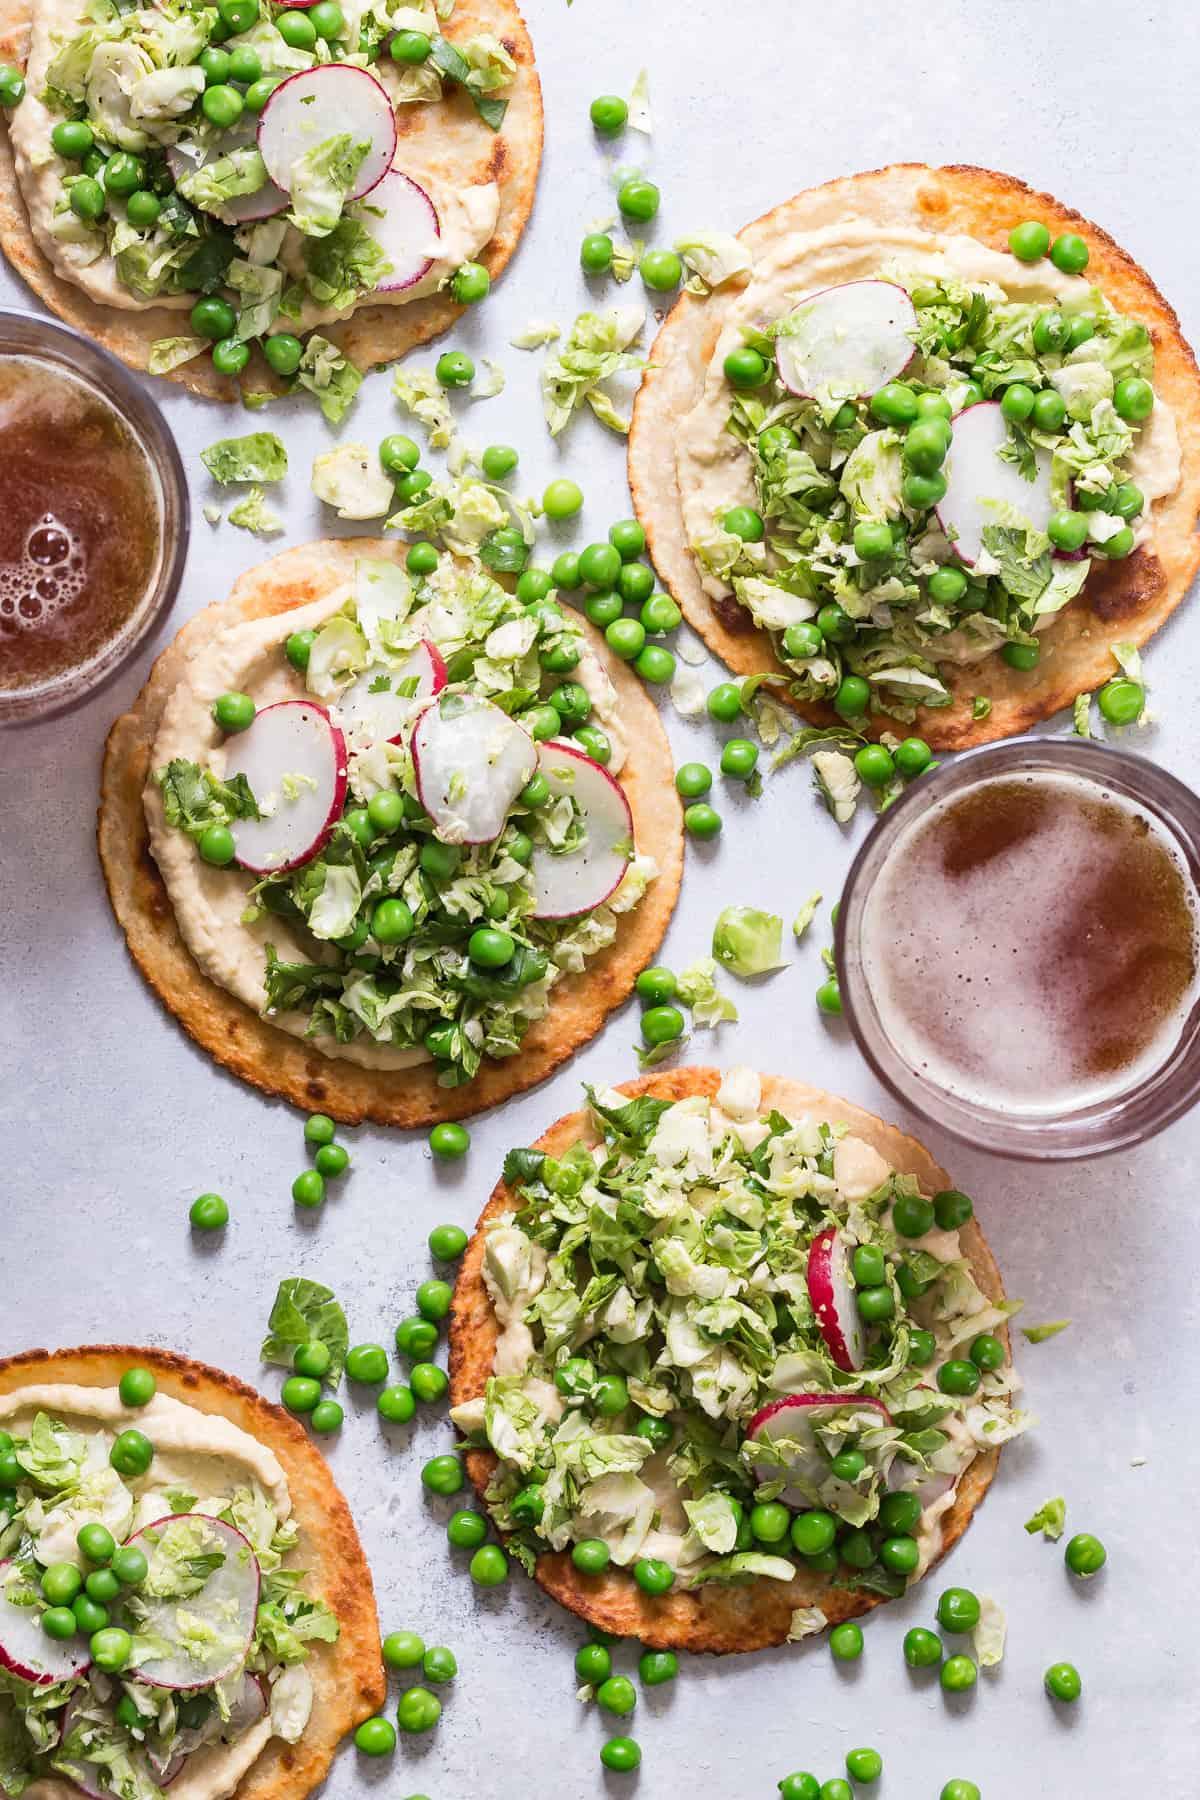 Creamy hummus on crispy tostadas.